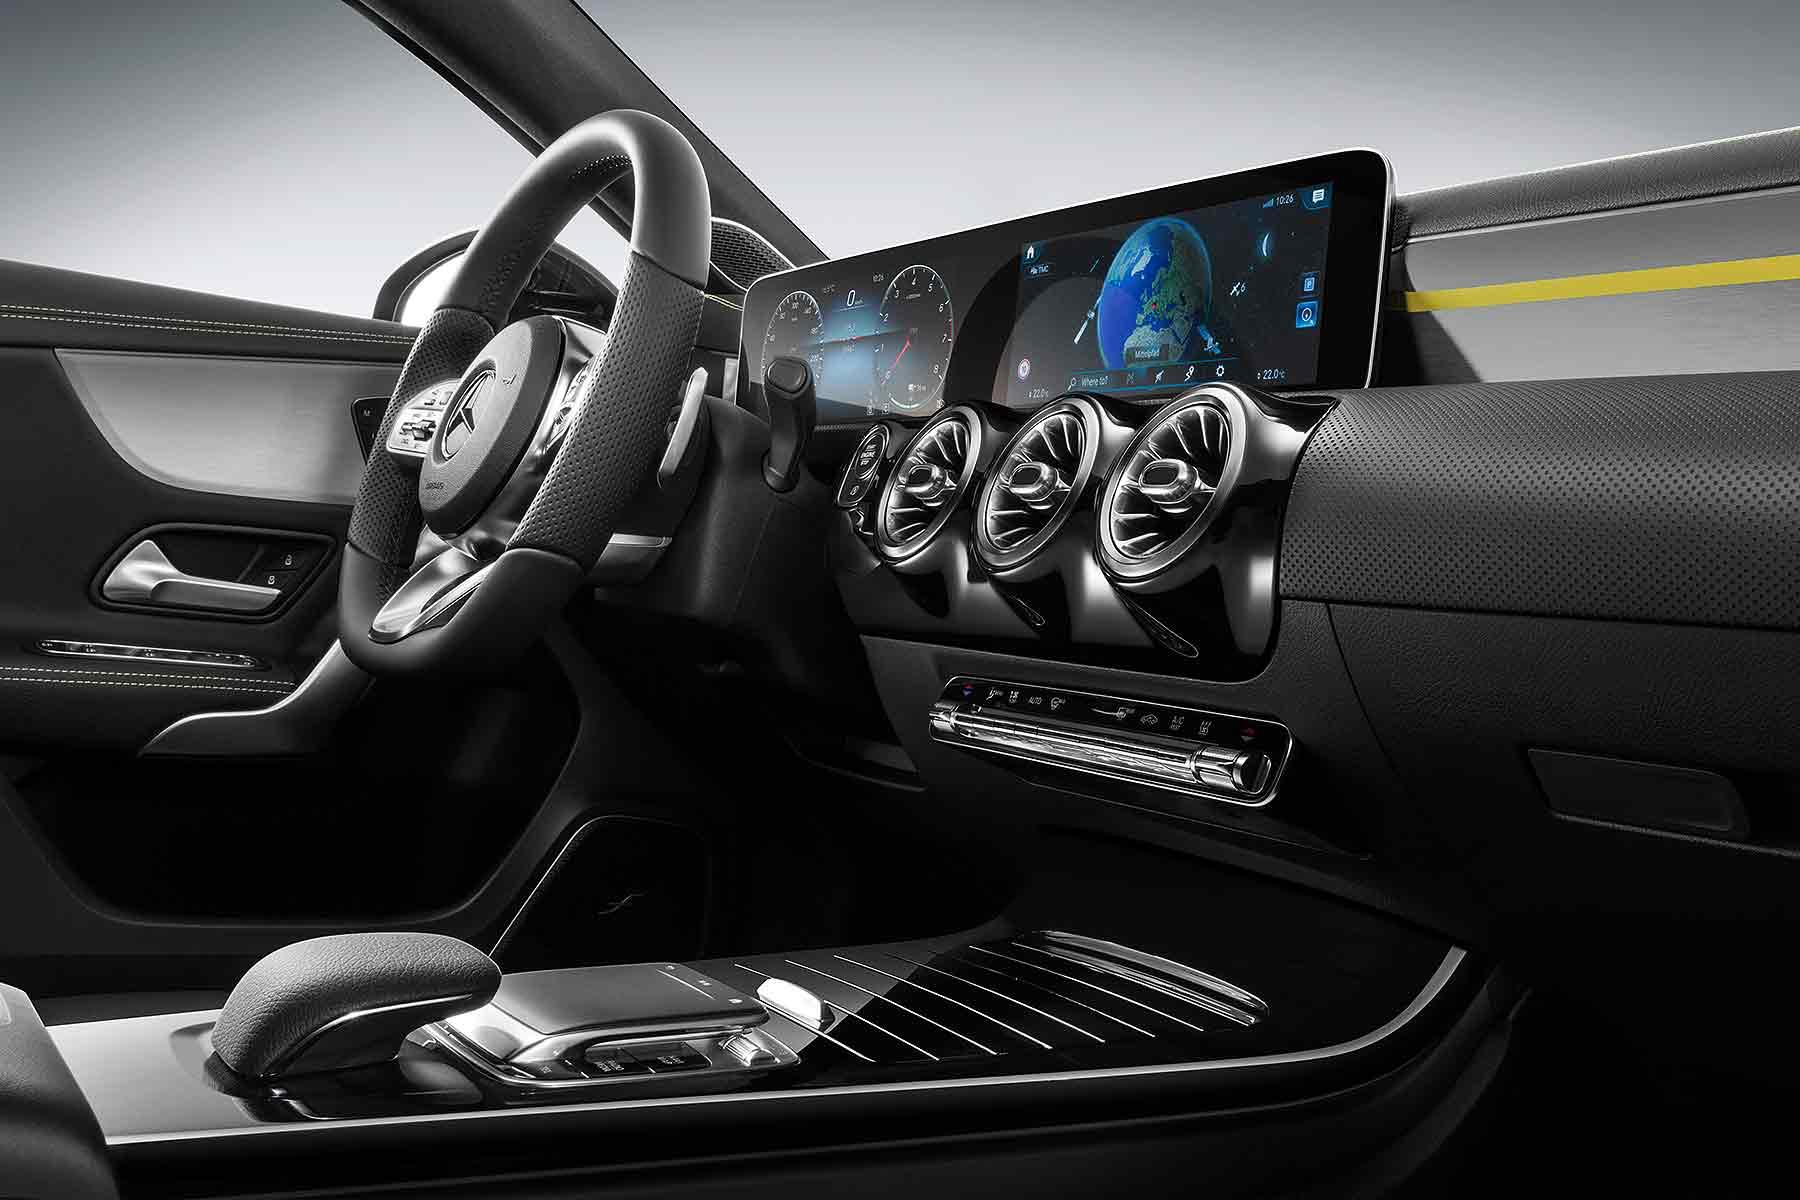 2018 Mercedes-Benz A-Class interior